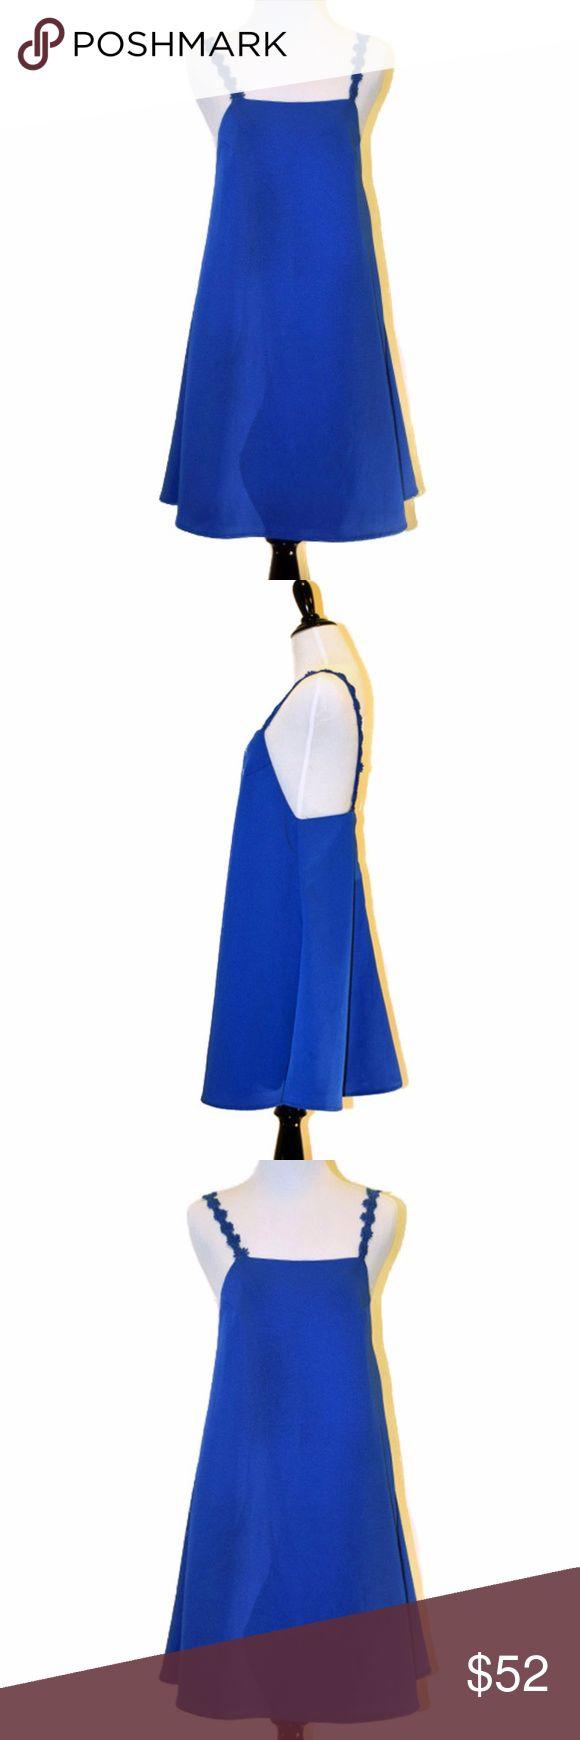 Eric + lani Daisy Strap Blue Mini Dress Daisy Strap Mini Dress  New With tag  Bright blue 100% Polyester Mini dress Hand wash cold Brand: Eric + lani Size Small Eric + lani Dresses Mini